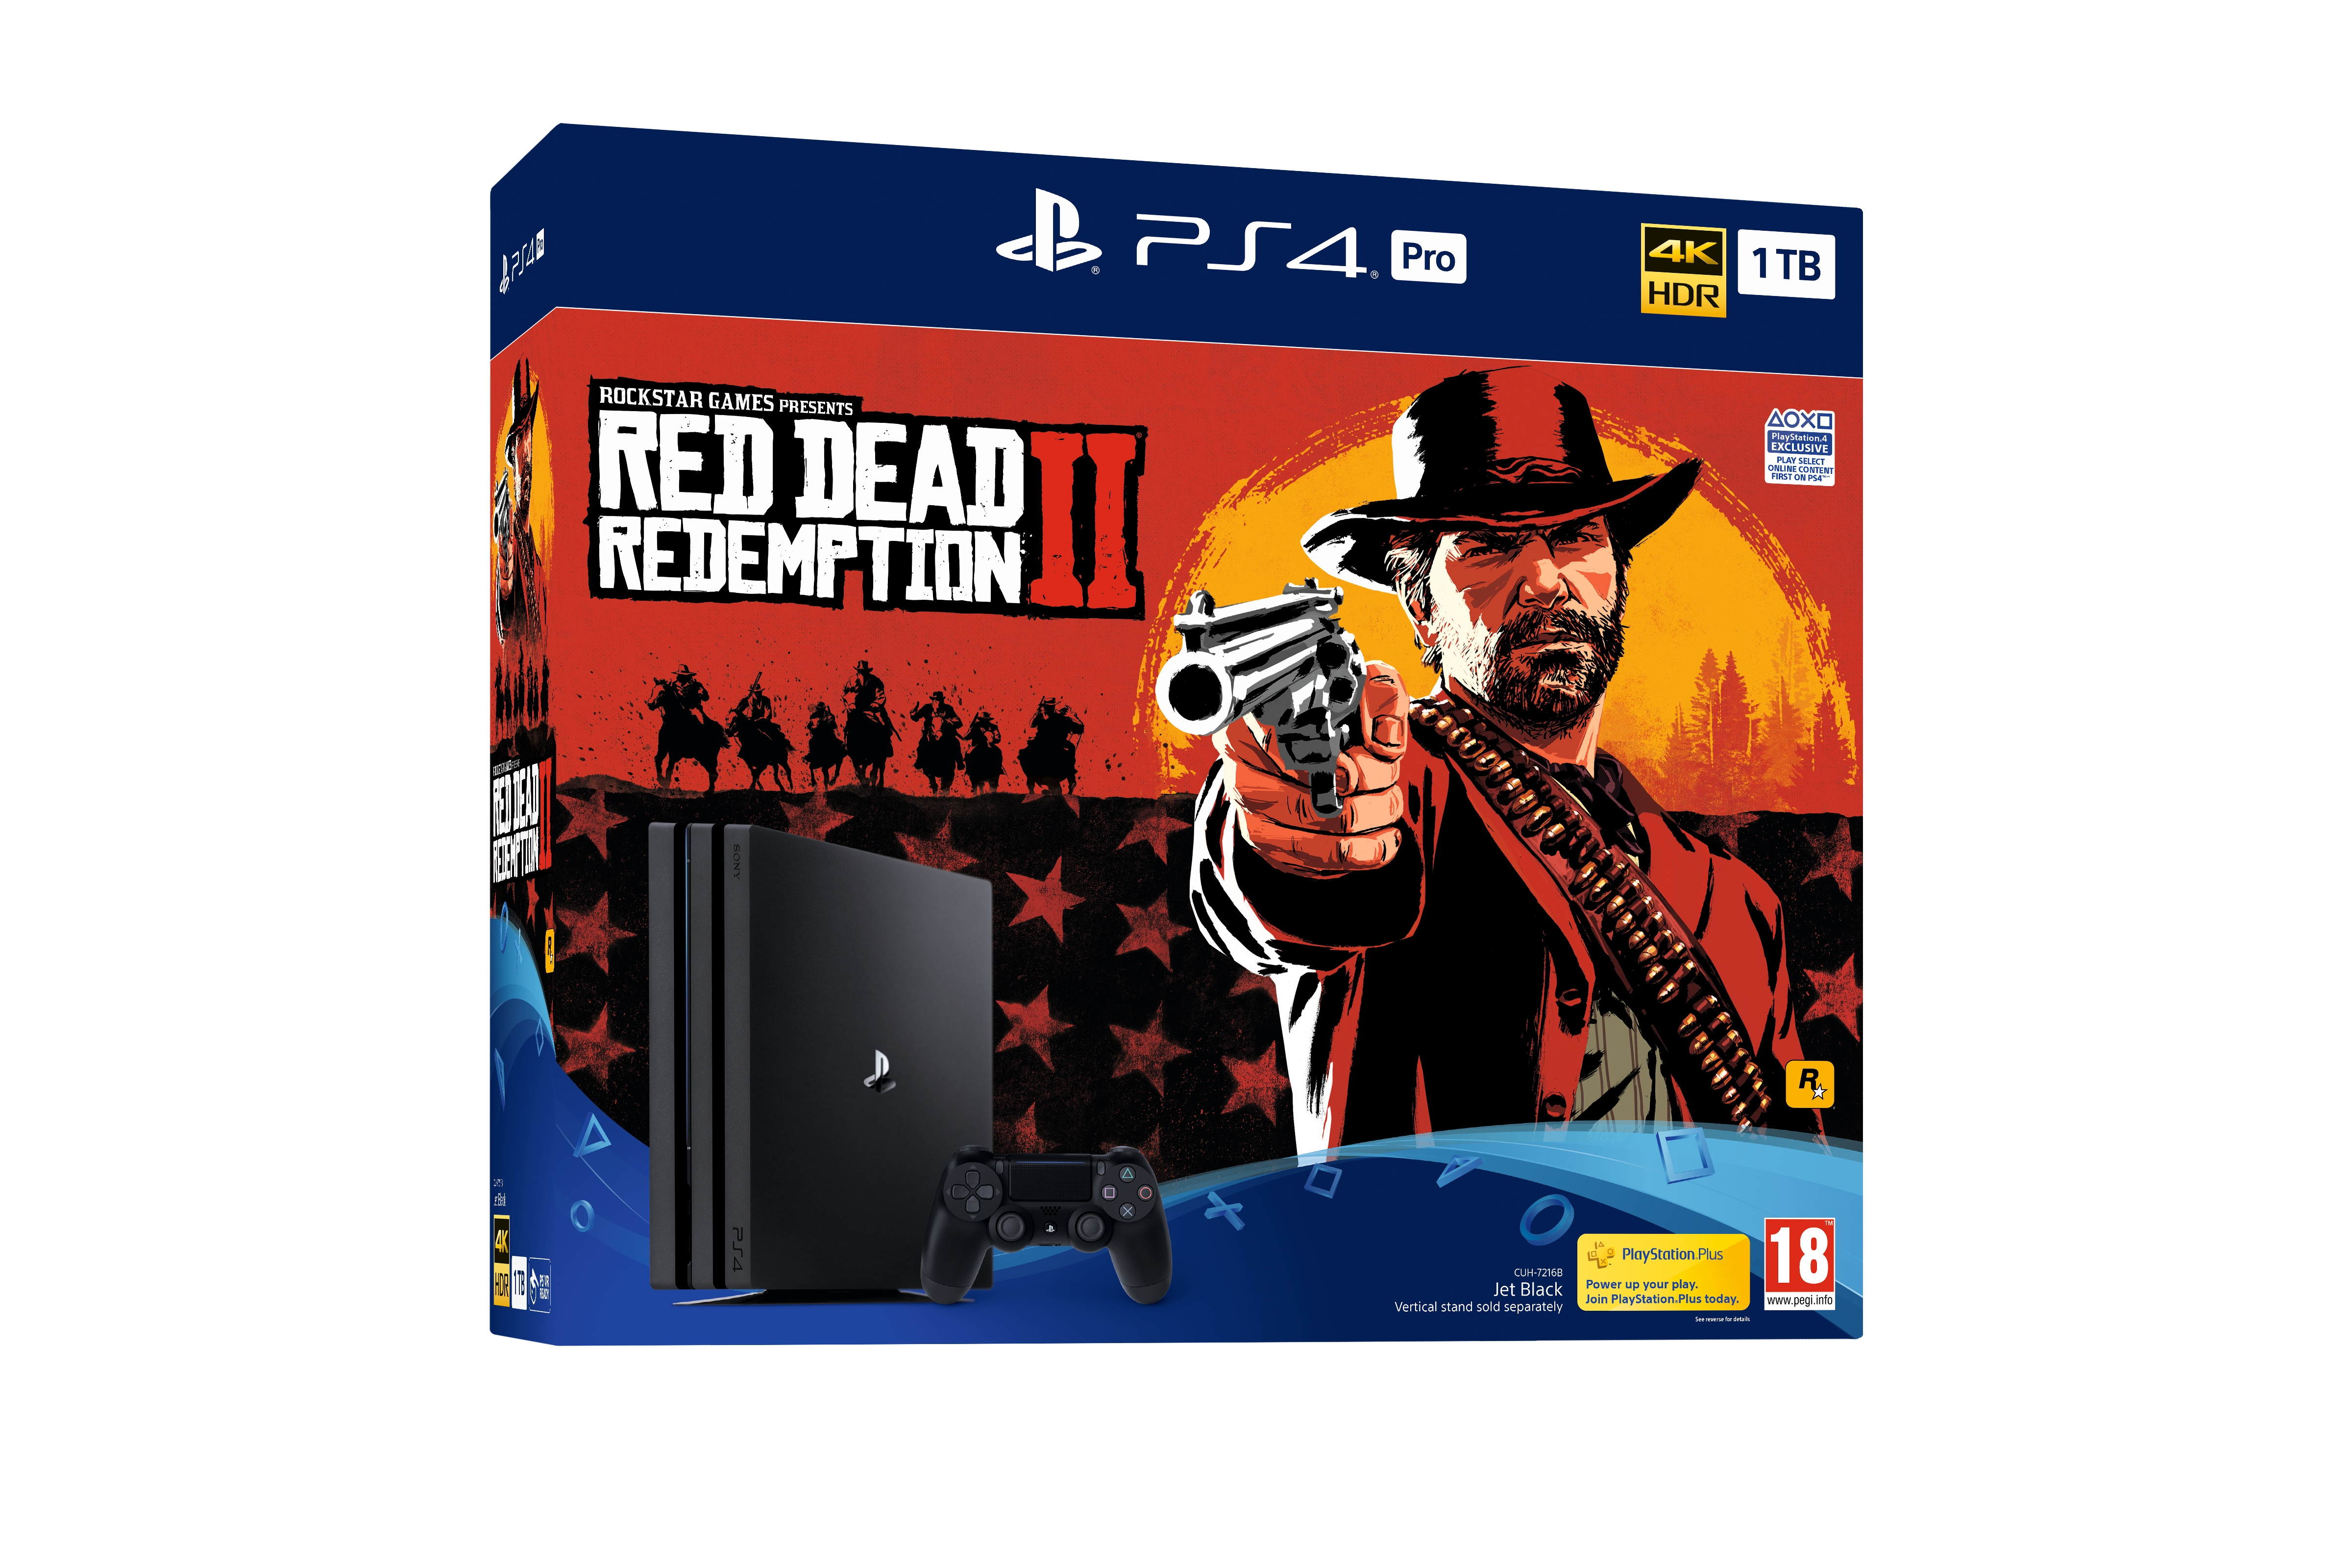 Red Dead Redemption 2 contará con 19 razas de caballos distintas